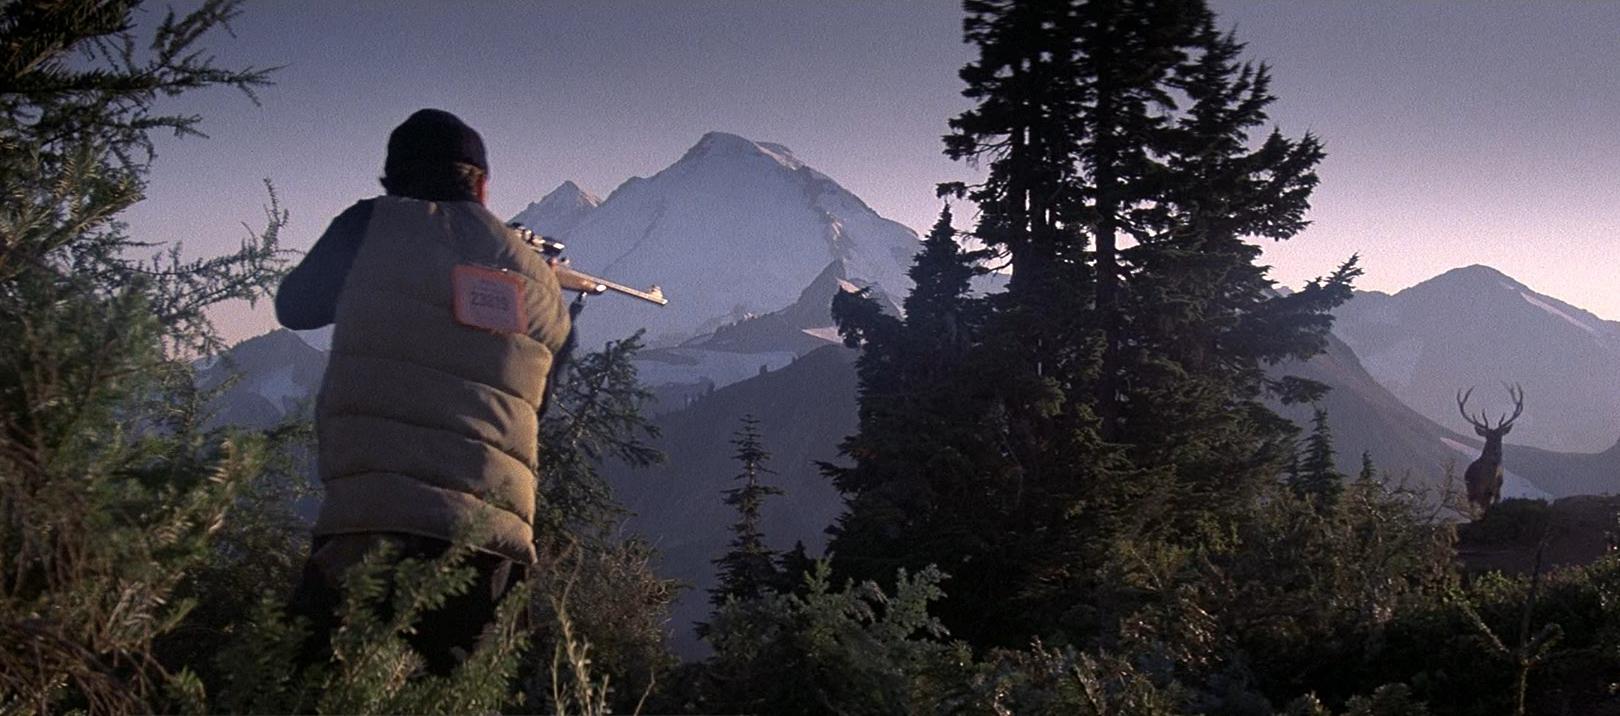 """The Deer Hunter"" Dir: Michael Cimino DP: Vilmos Zsigmond, ASC"